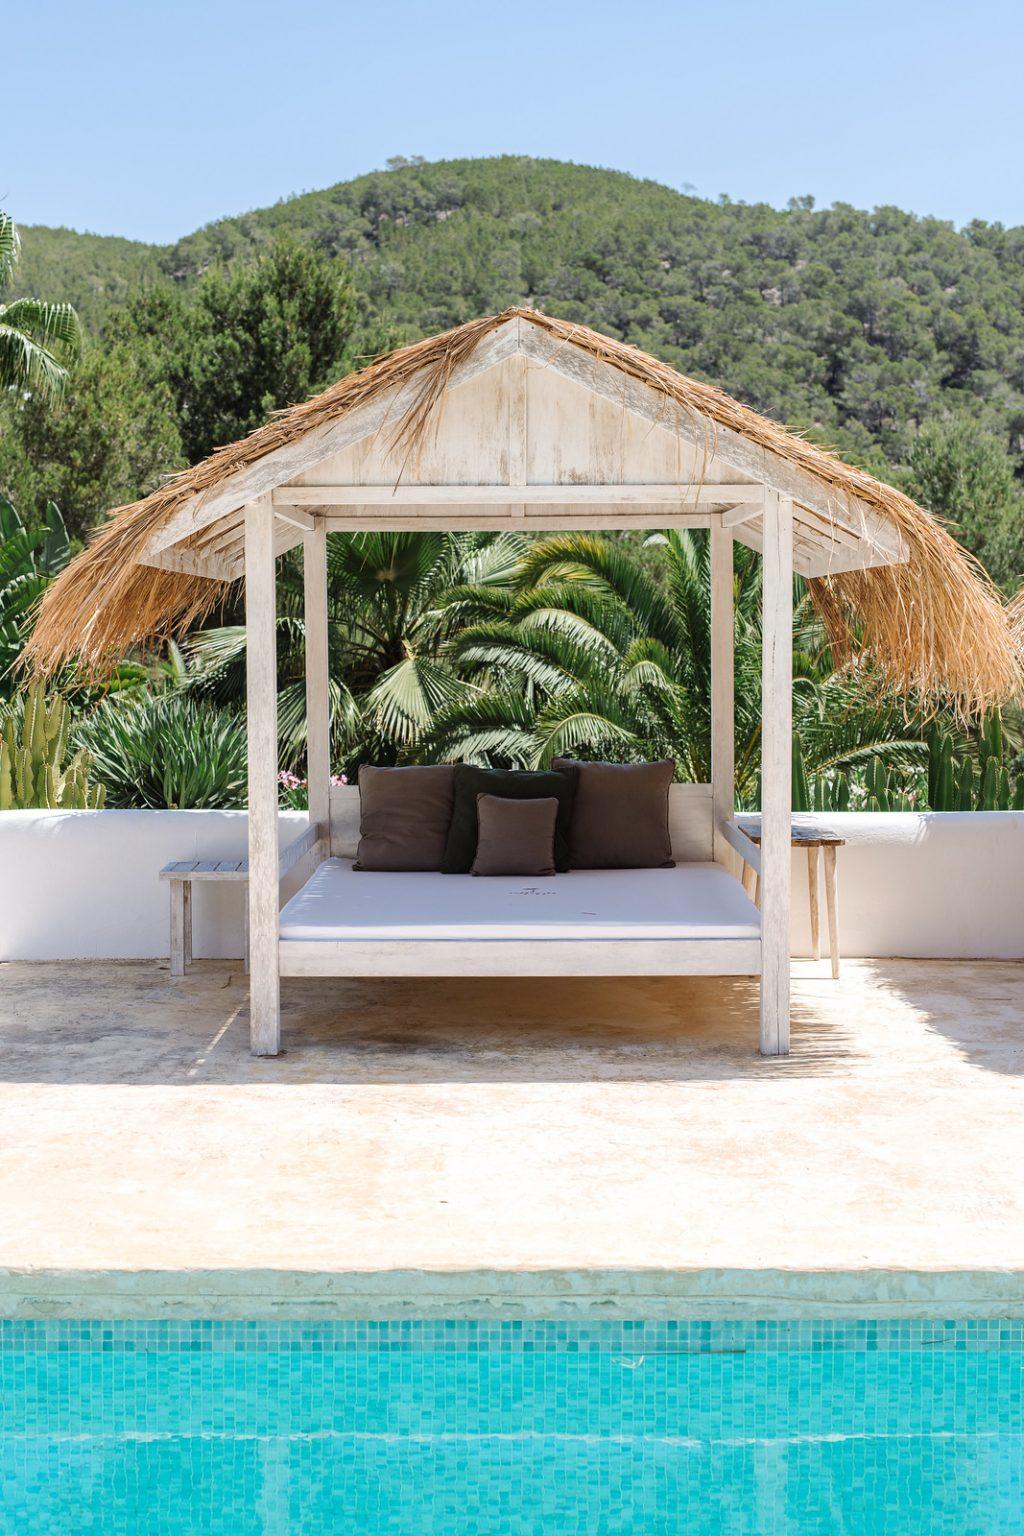 https://www.white-ibiza.com/wp-content/uploads/2020/03/ibiza-hotels-pure-house-ibiza-ana-lui-2021-05-1024x1536.jpg